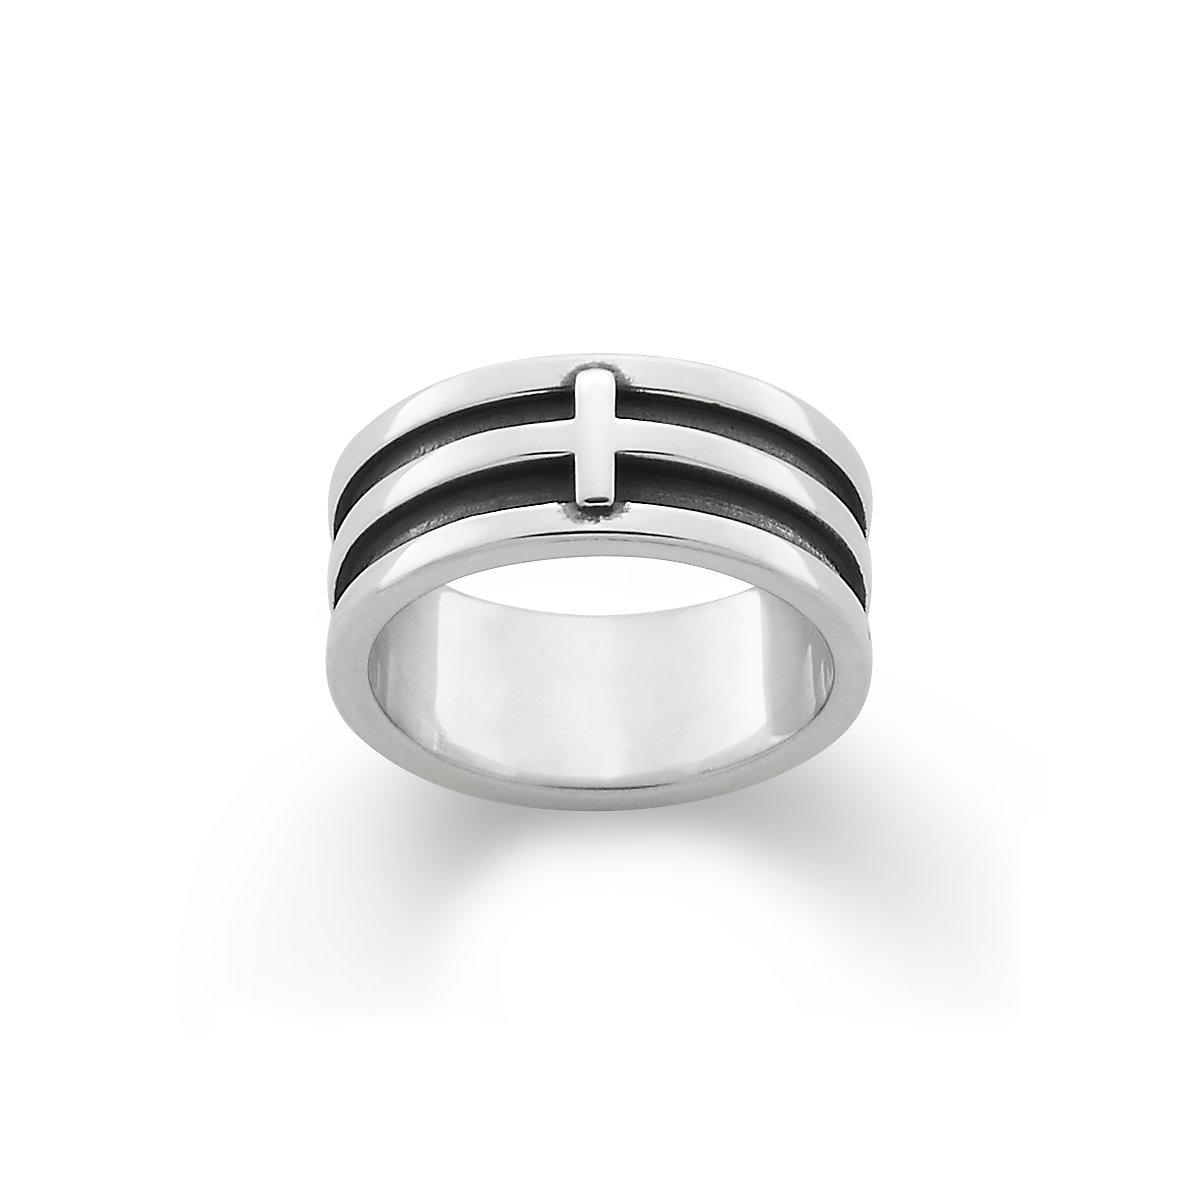 danish cross ring - James Avery Wedding Rings